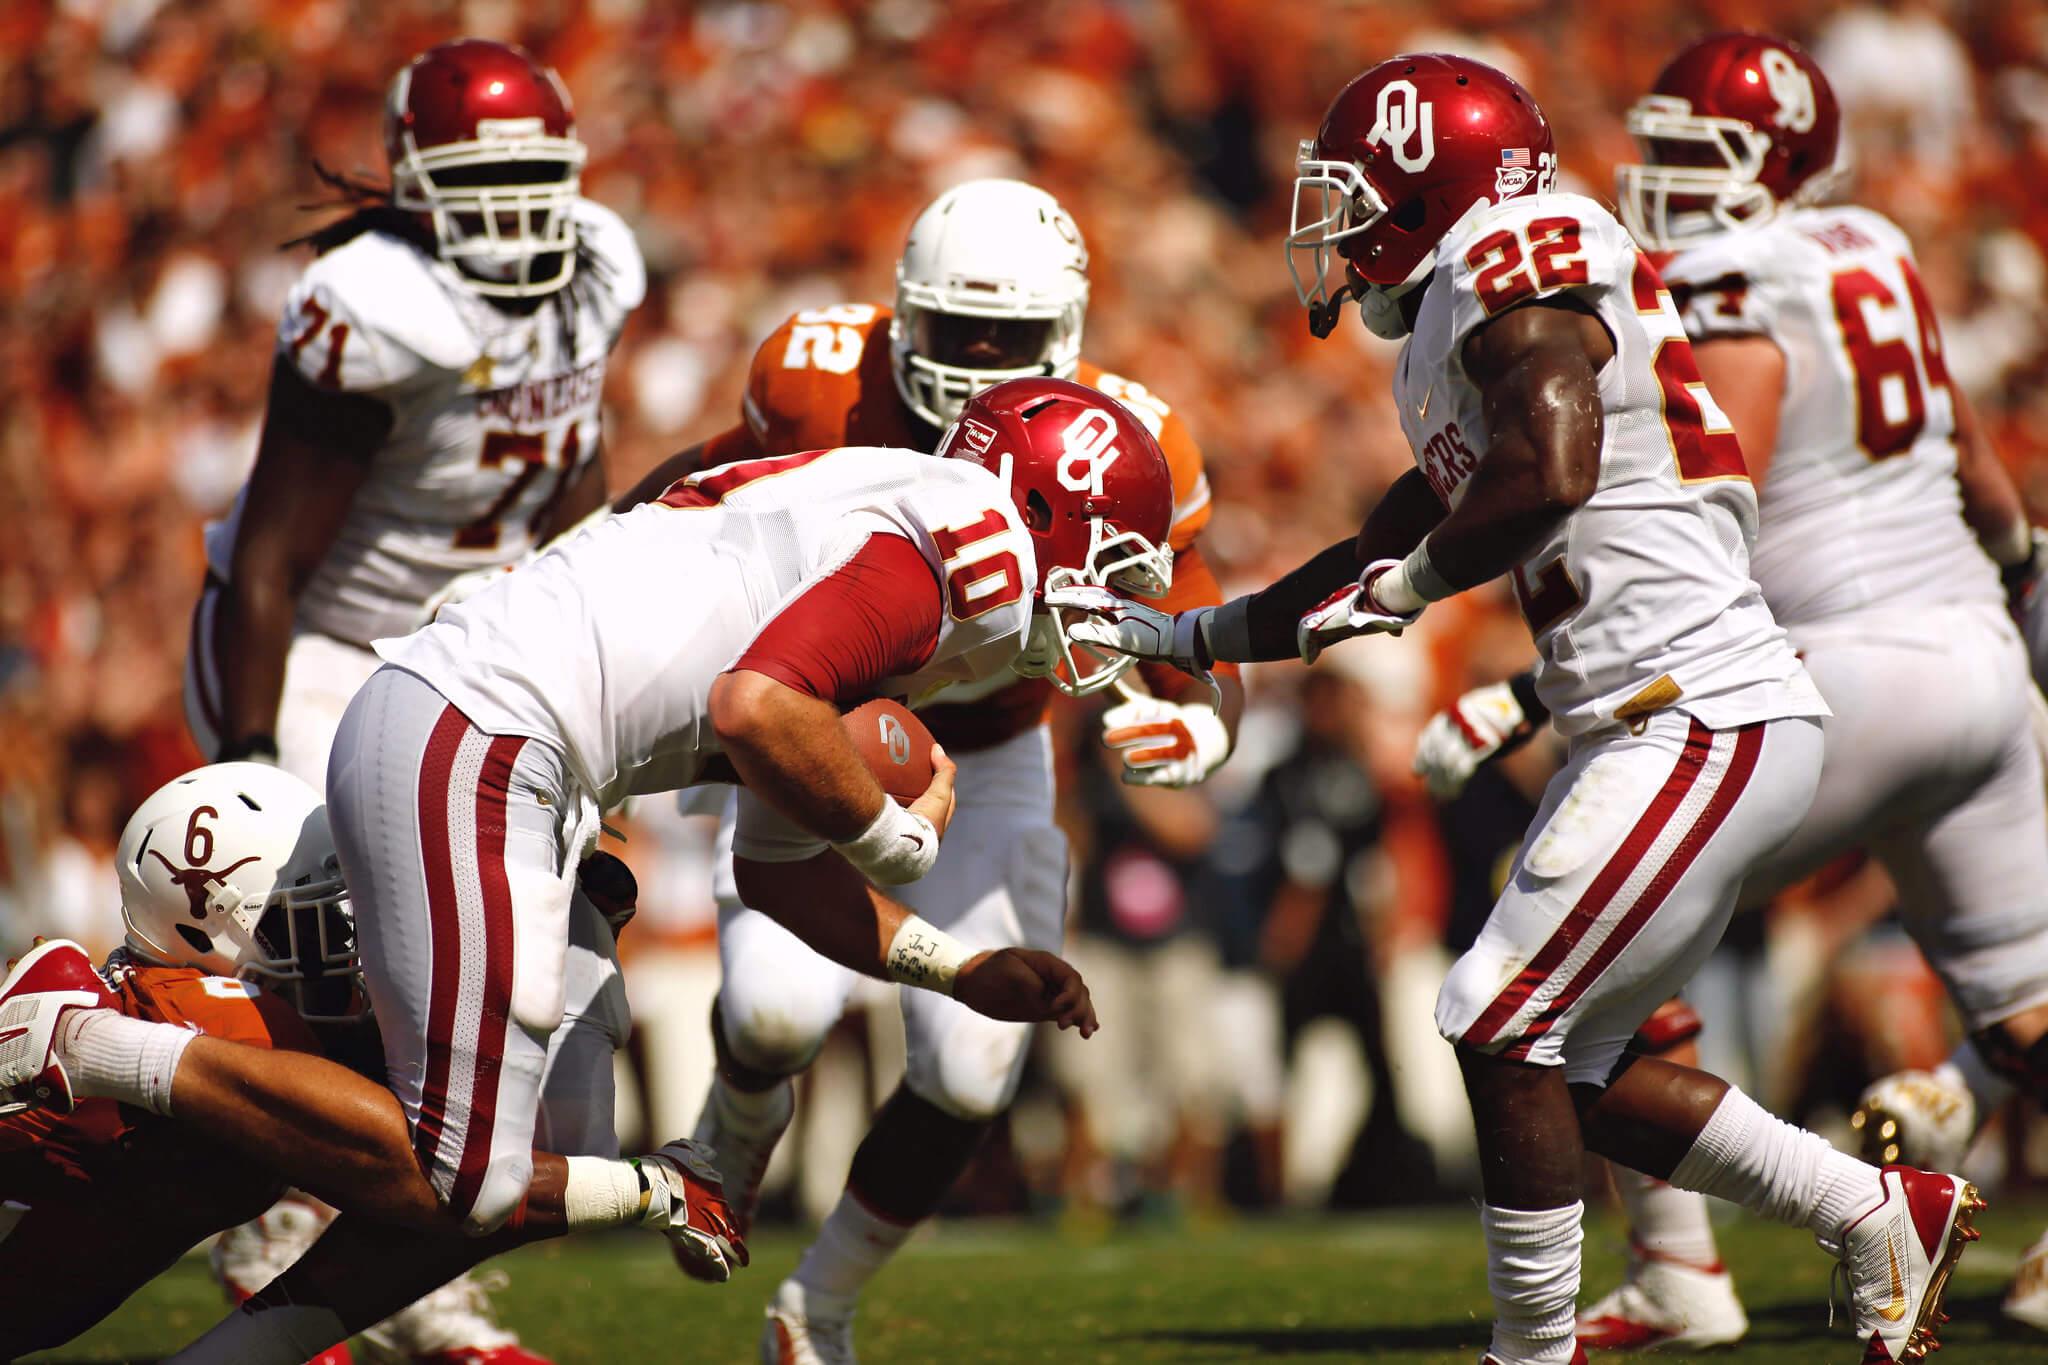 Oklahoma vs Texas Red River Rivalry